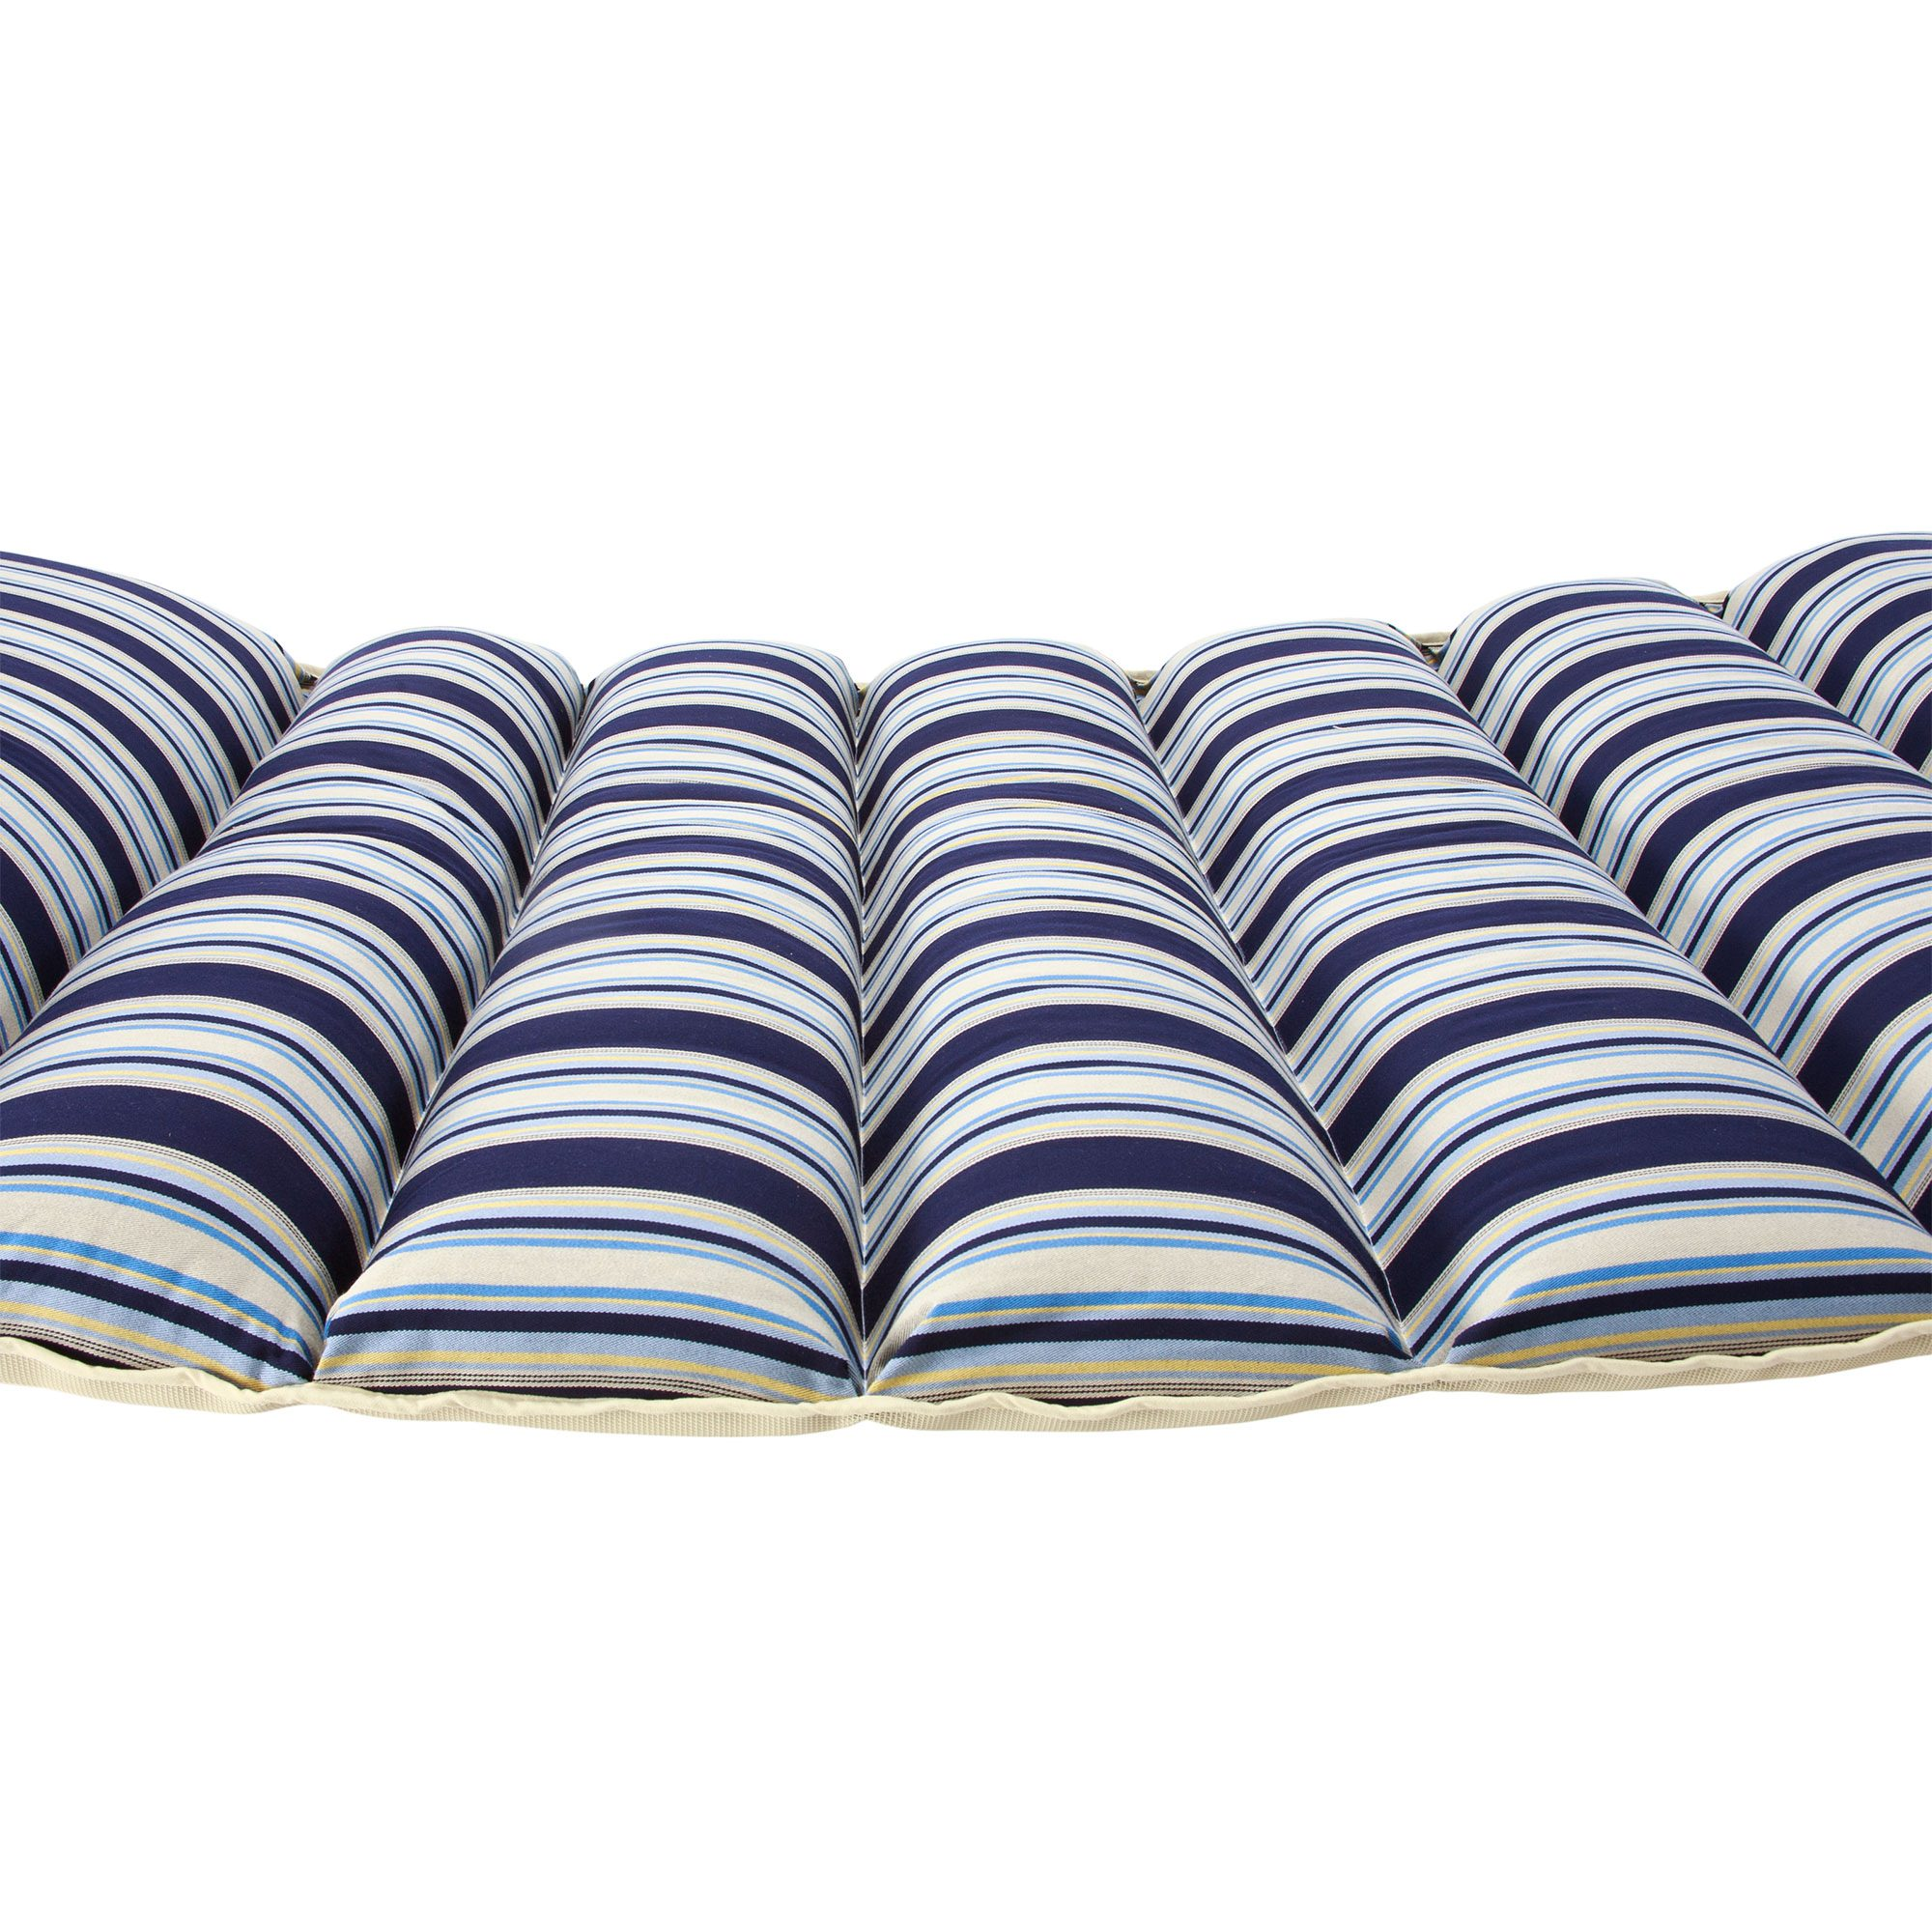 pillowtop hammock   hamptons summer stripe     hamptons summer stripe pillowtop hammock   dfohome  rh   dfohome